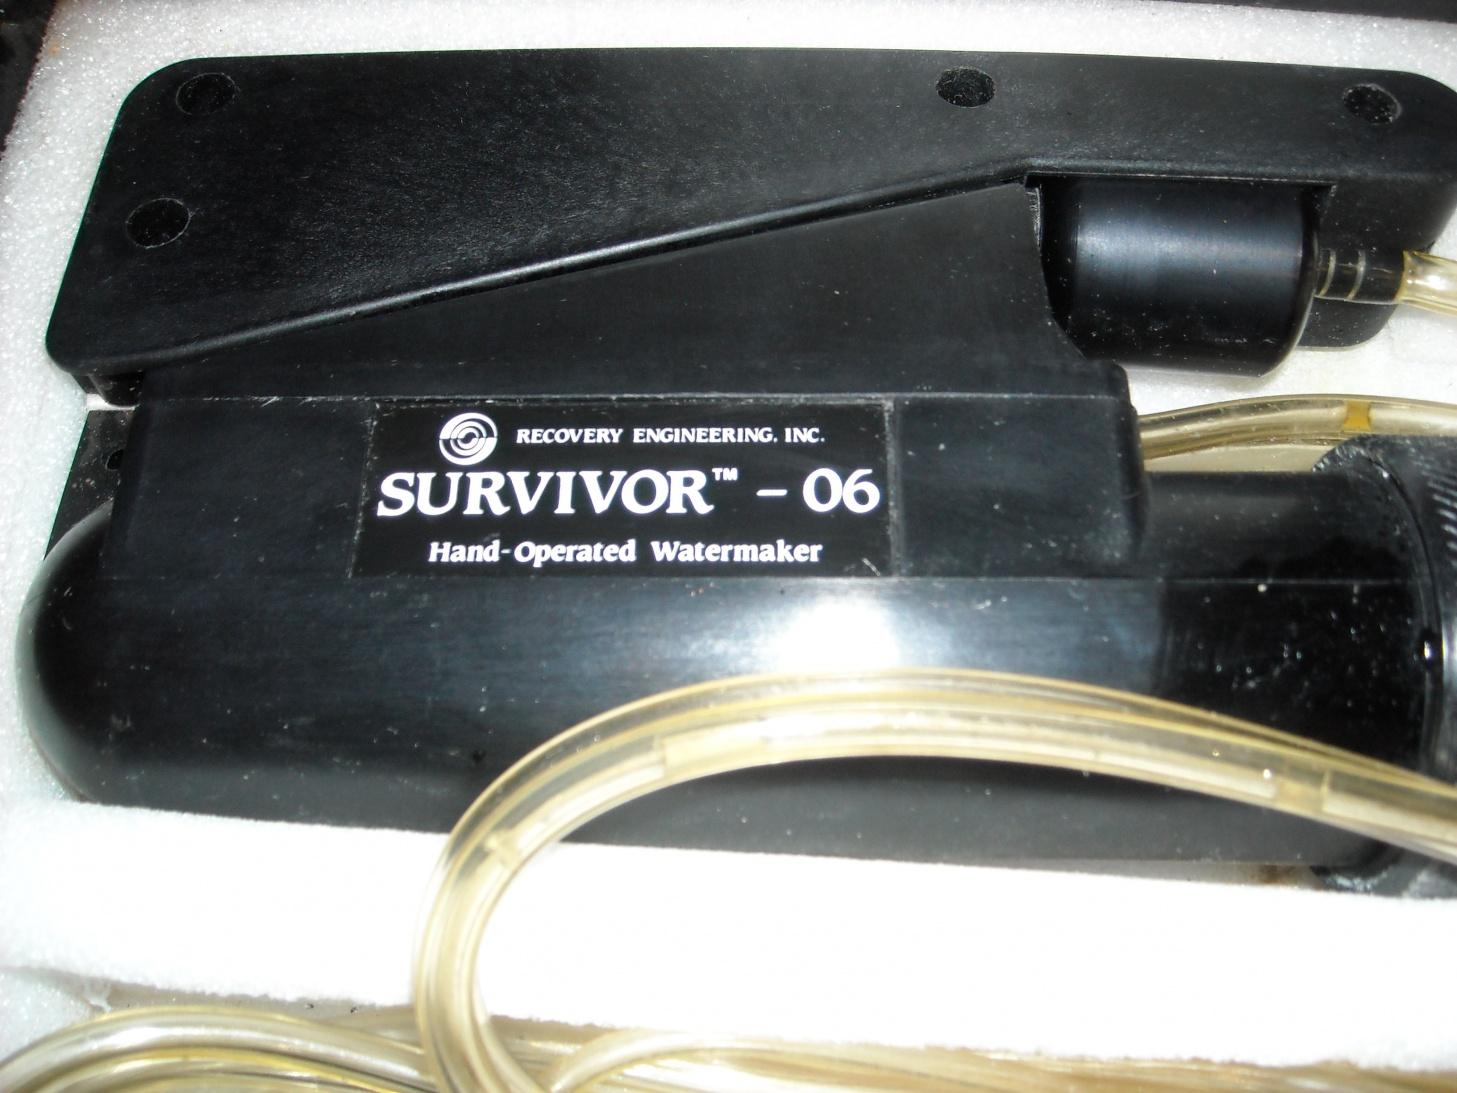 Click image for larger version  Name:Watermaker Survivor 06 004.jpg Views:102 Size:409.6 KB ID:56192